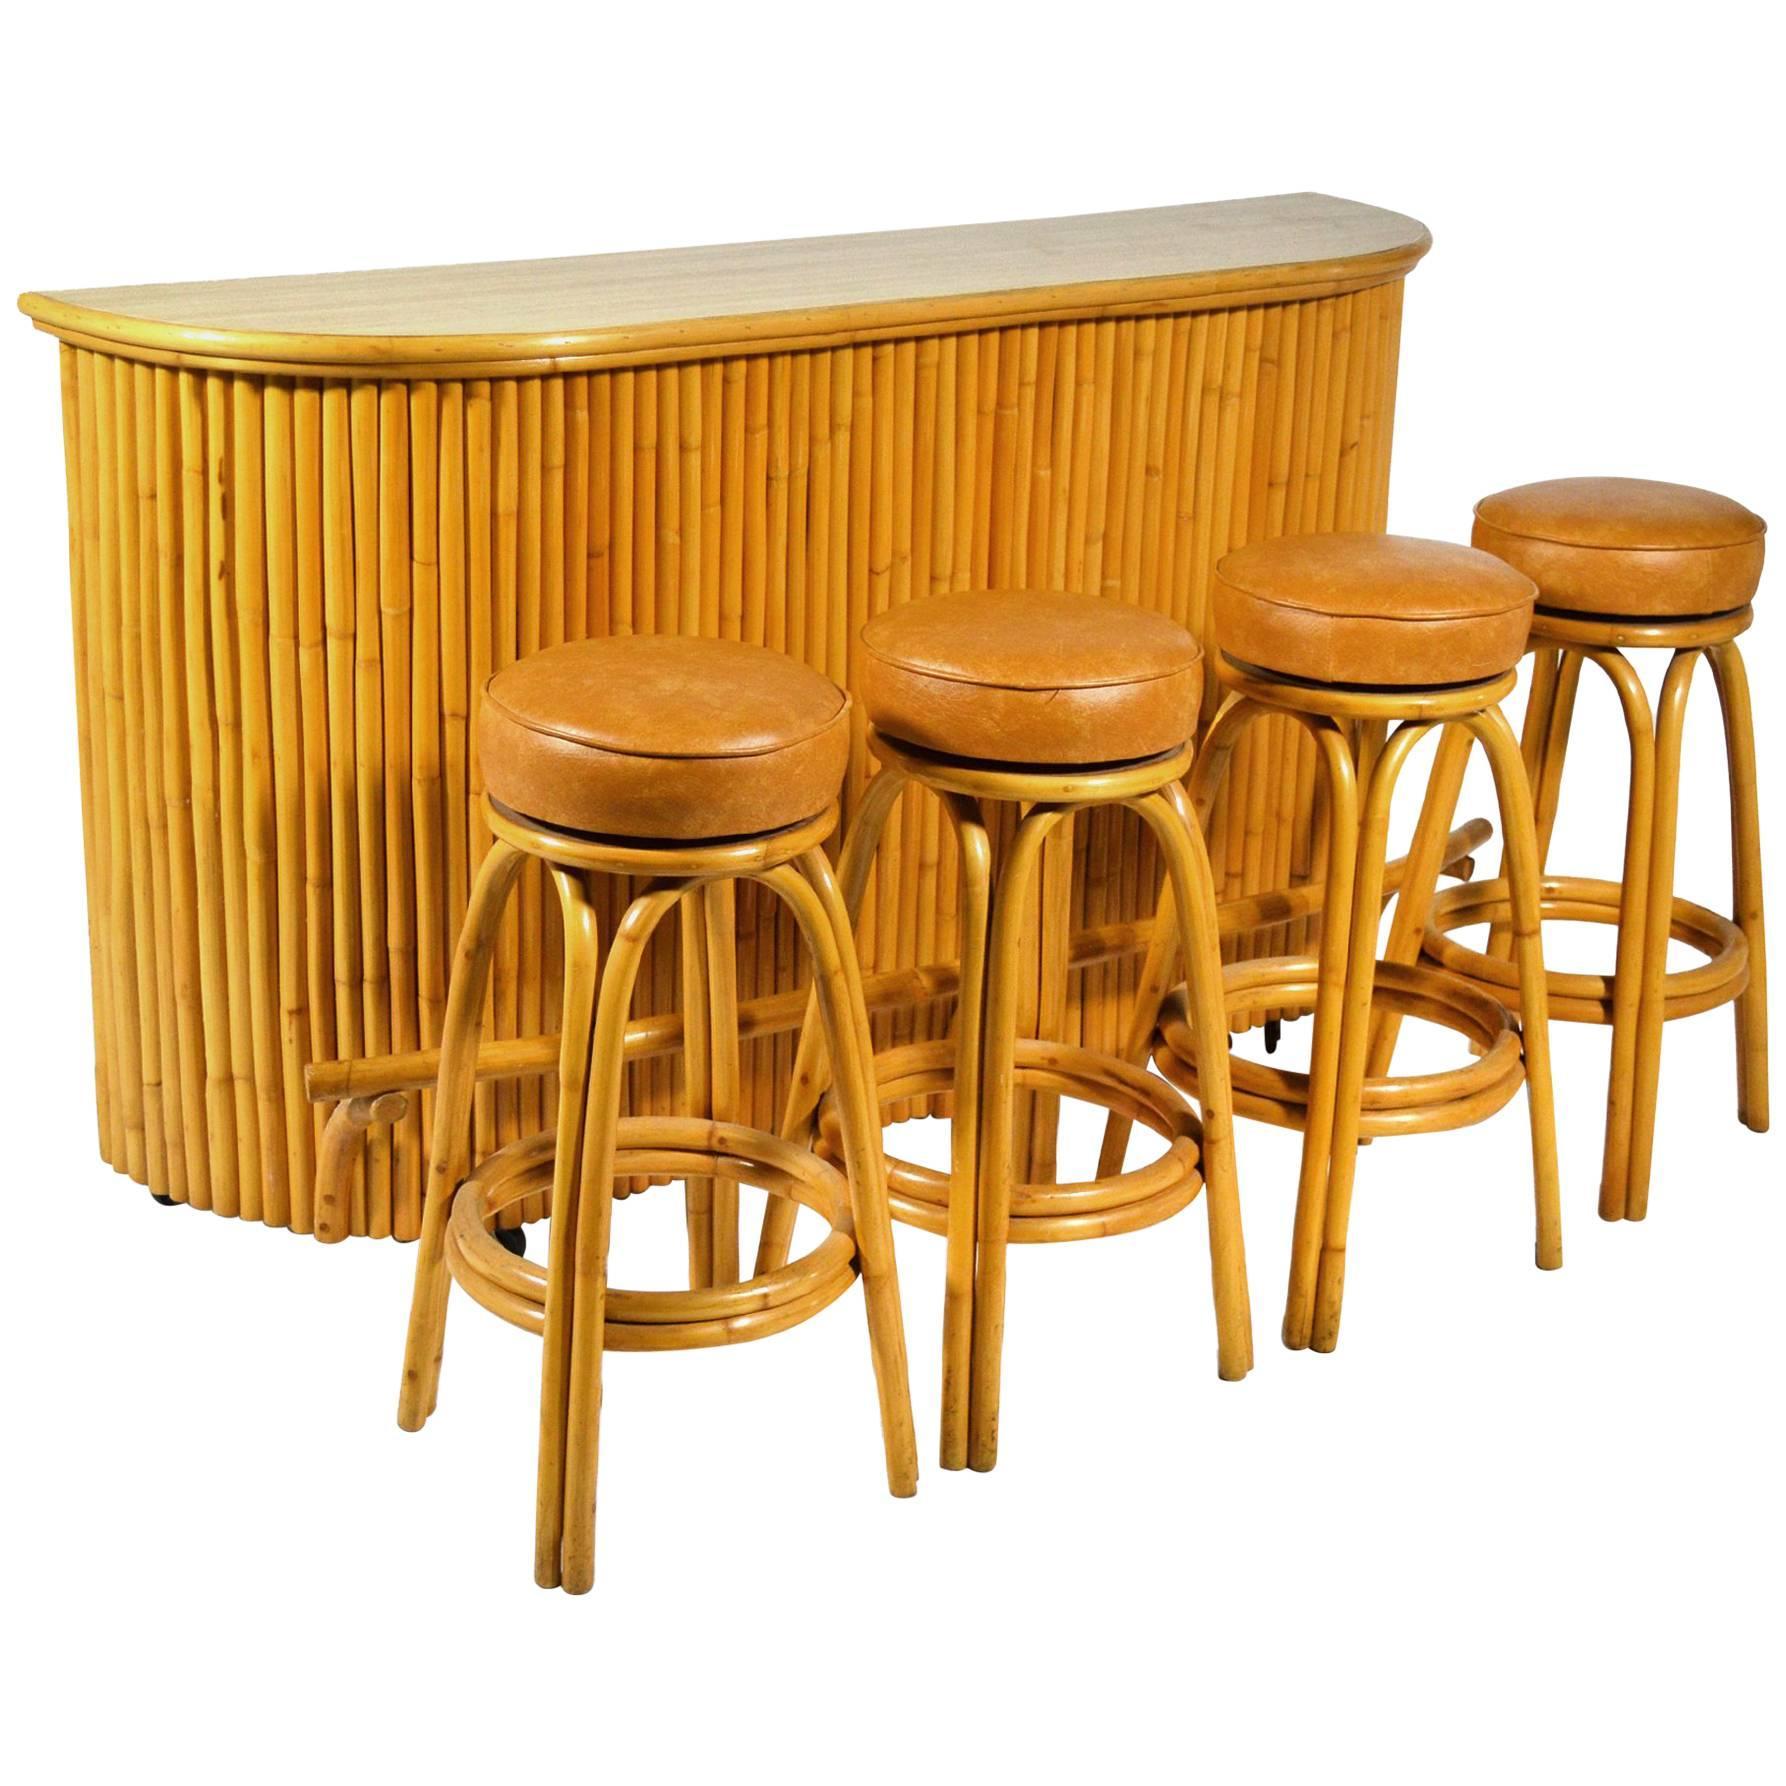 tropical rattan tiki bar with four stools at 1stdibs rh 1stdibs com Small Tiki Bars for Sale Small Outdoor Bar for Sale